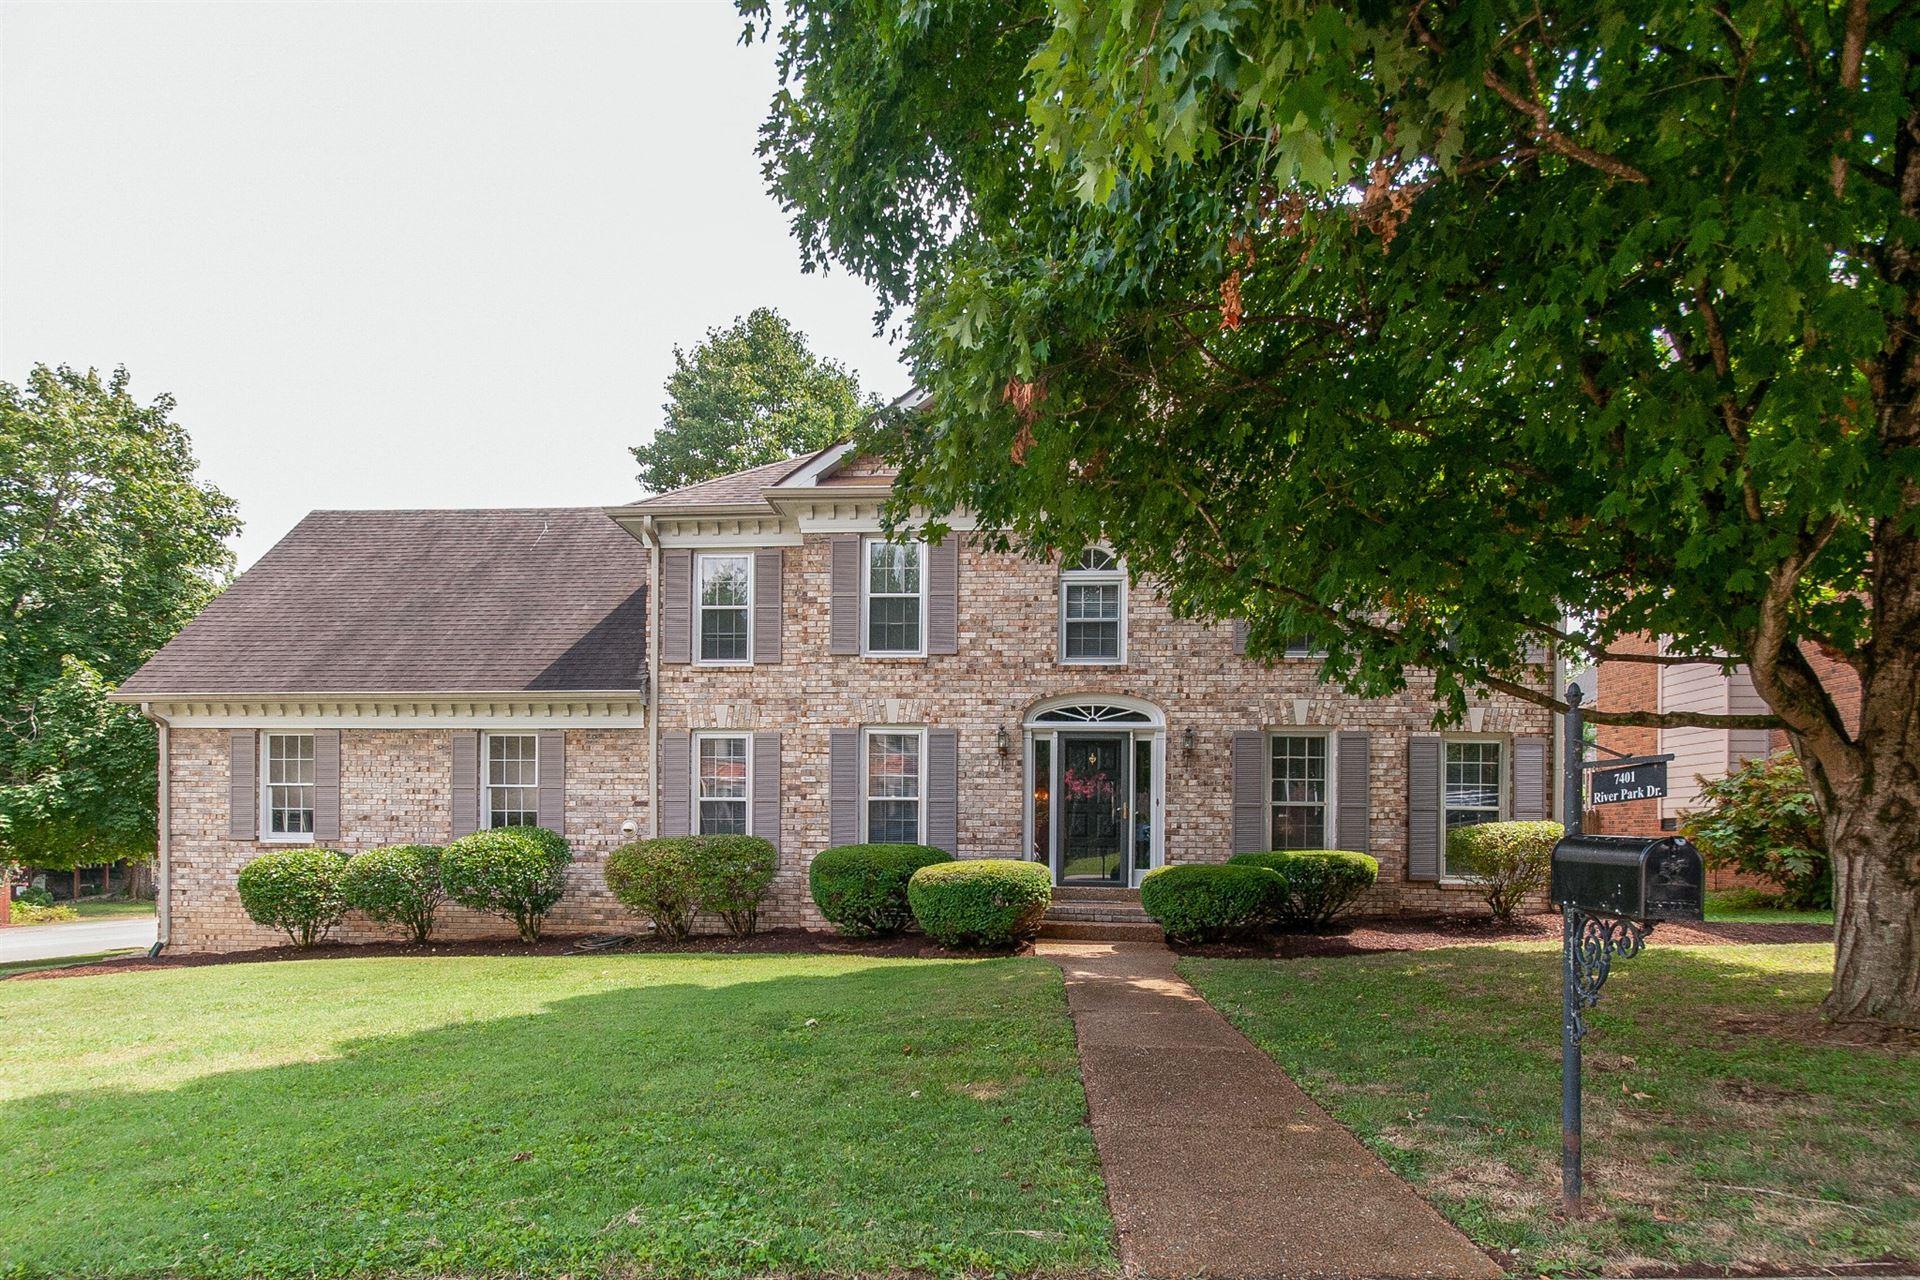 7401 River Park Dr, Nashville, TN 37221 - MLS#: 2276682